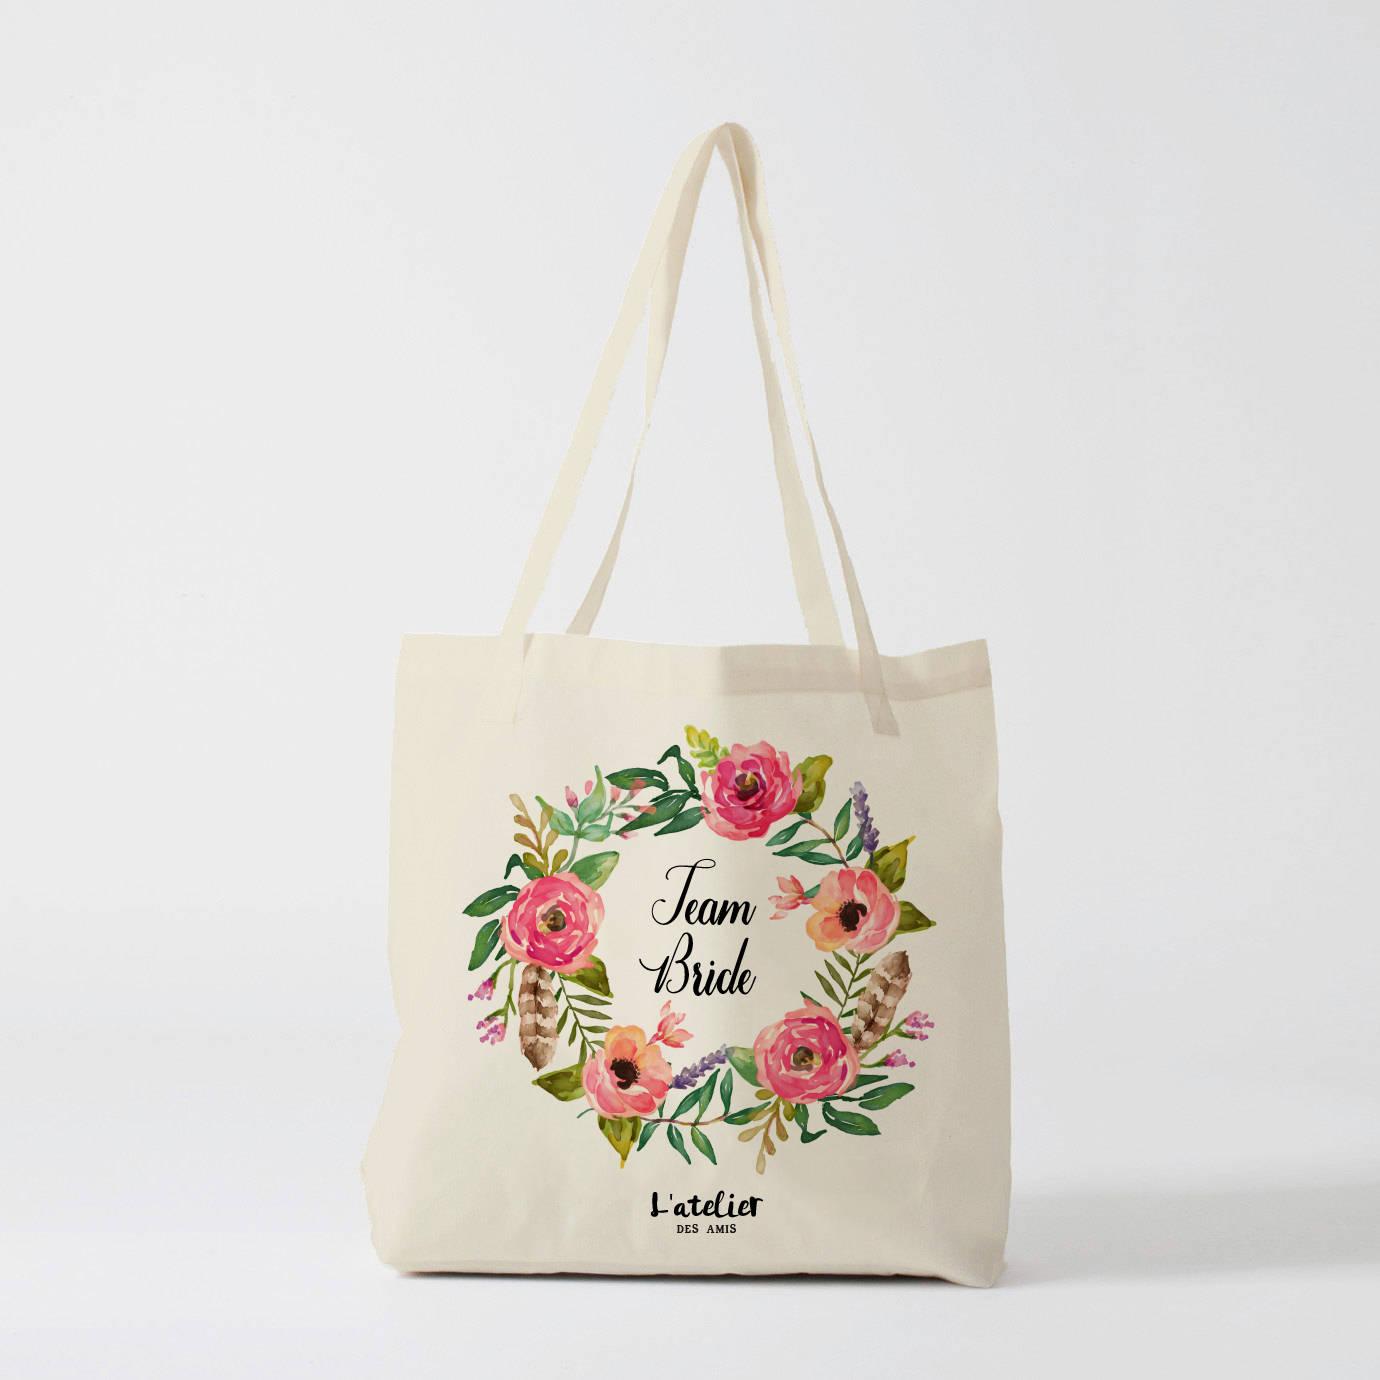 w125y team bride tote bag personnalis sac de toile sac. Black Bedroom Furniture Sets. Home Design Ideas